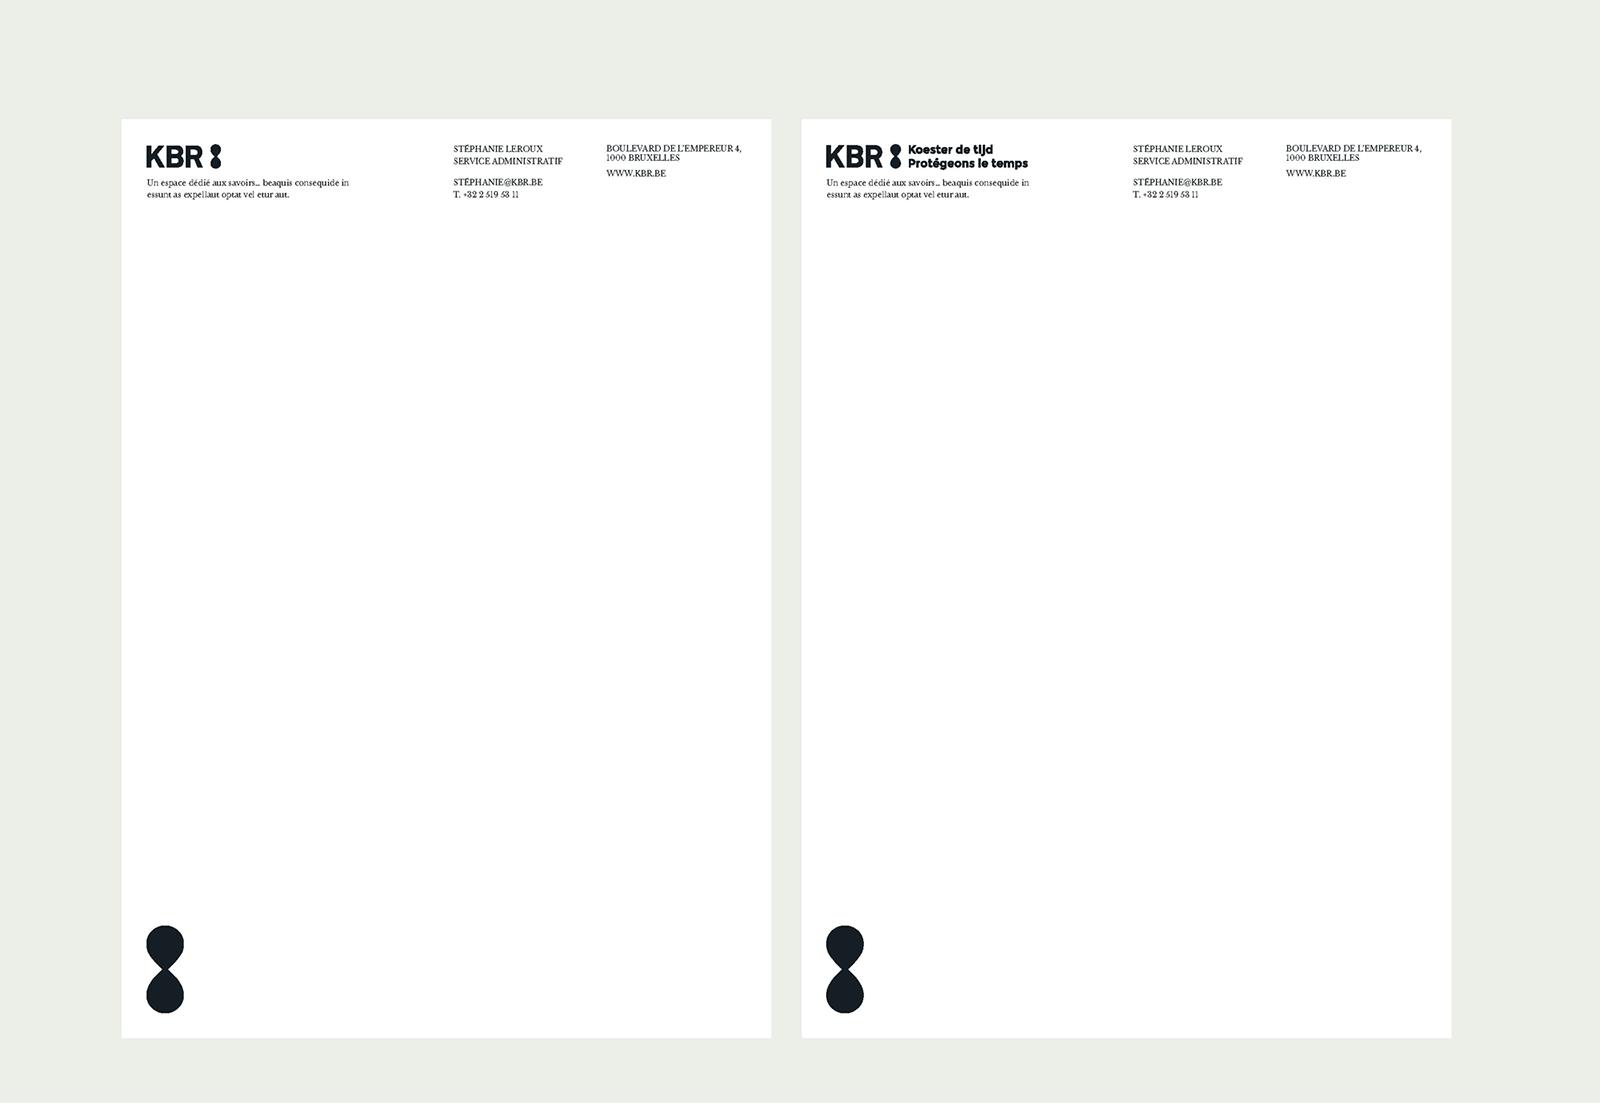 KBR比利时皇家图书馆启用全新的品牌VI形象设计-深圳VI设计4